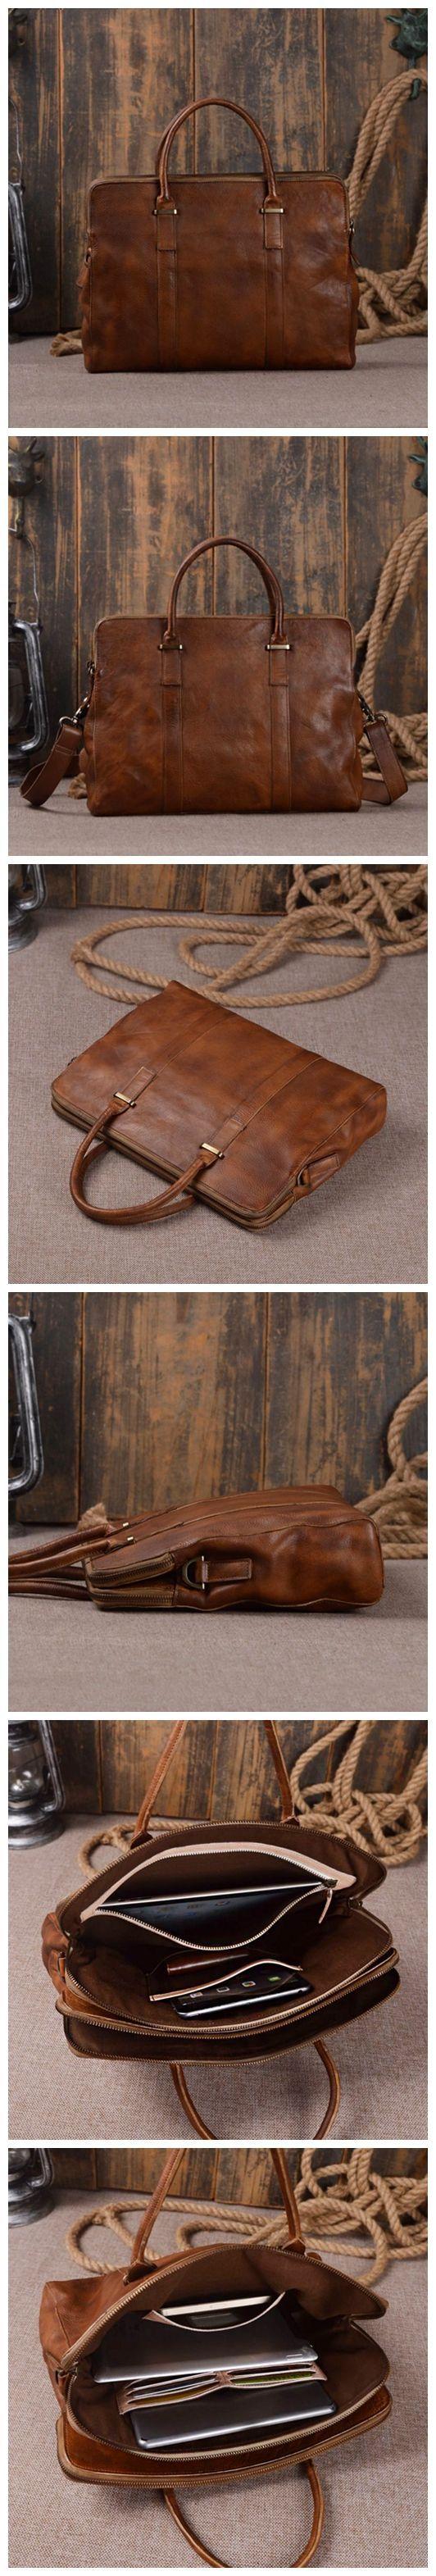 Men Italian Leather Portfolio Laptop Bag Men High Quality Leather Briefcase Messenger Shoulder Handbag Men's Briefcase